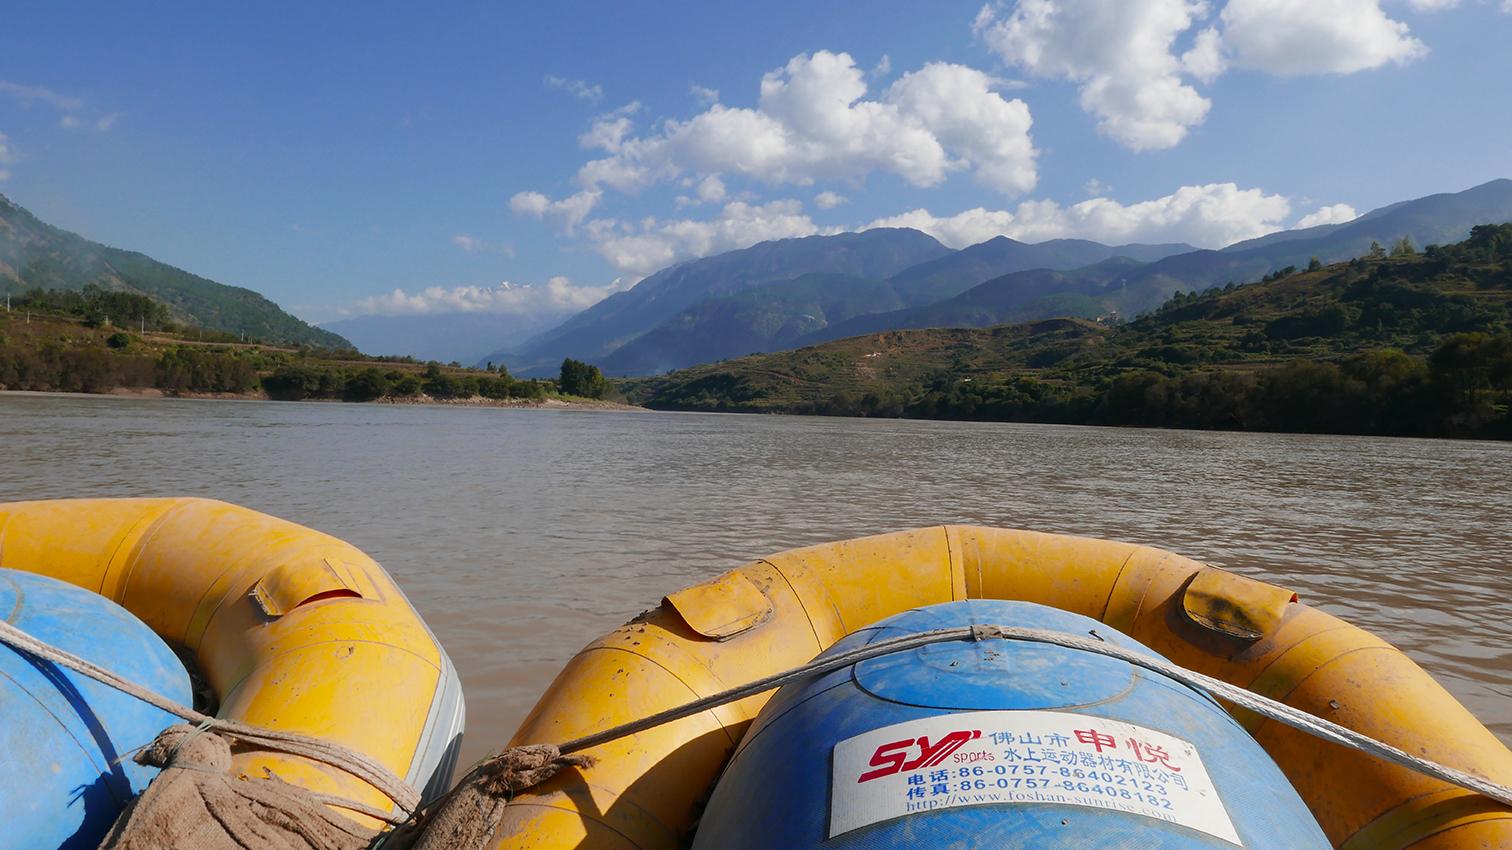 Bootsfahrt auf dem Jangtsekiang, Provinz Yunnan, China